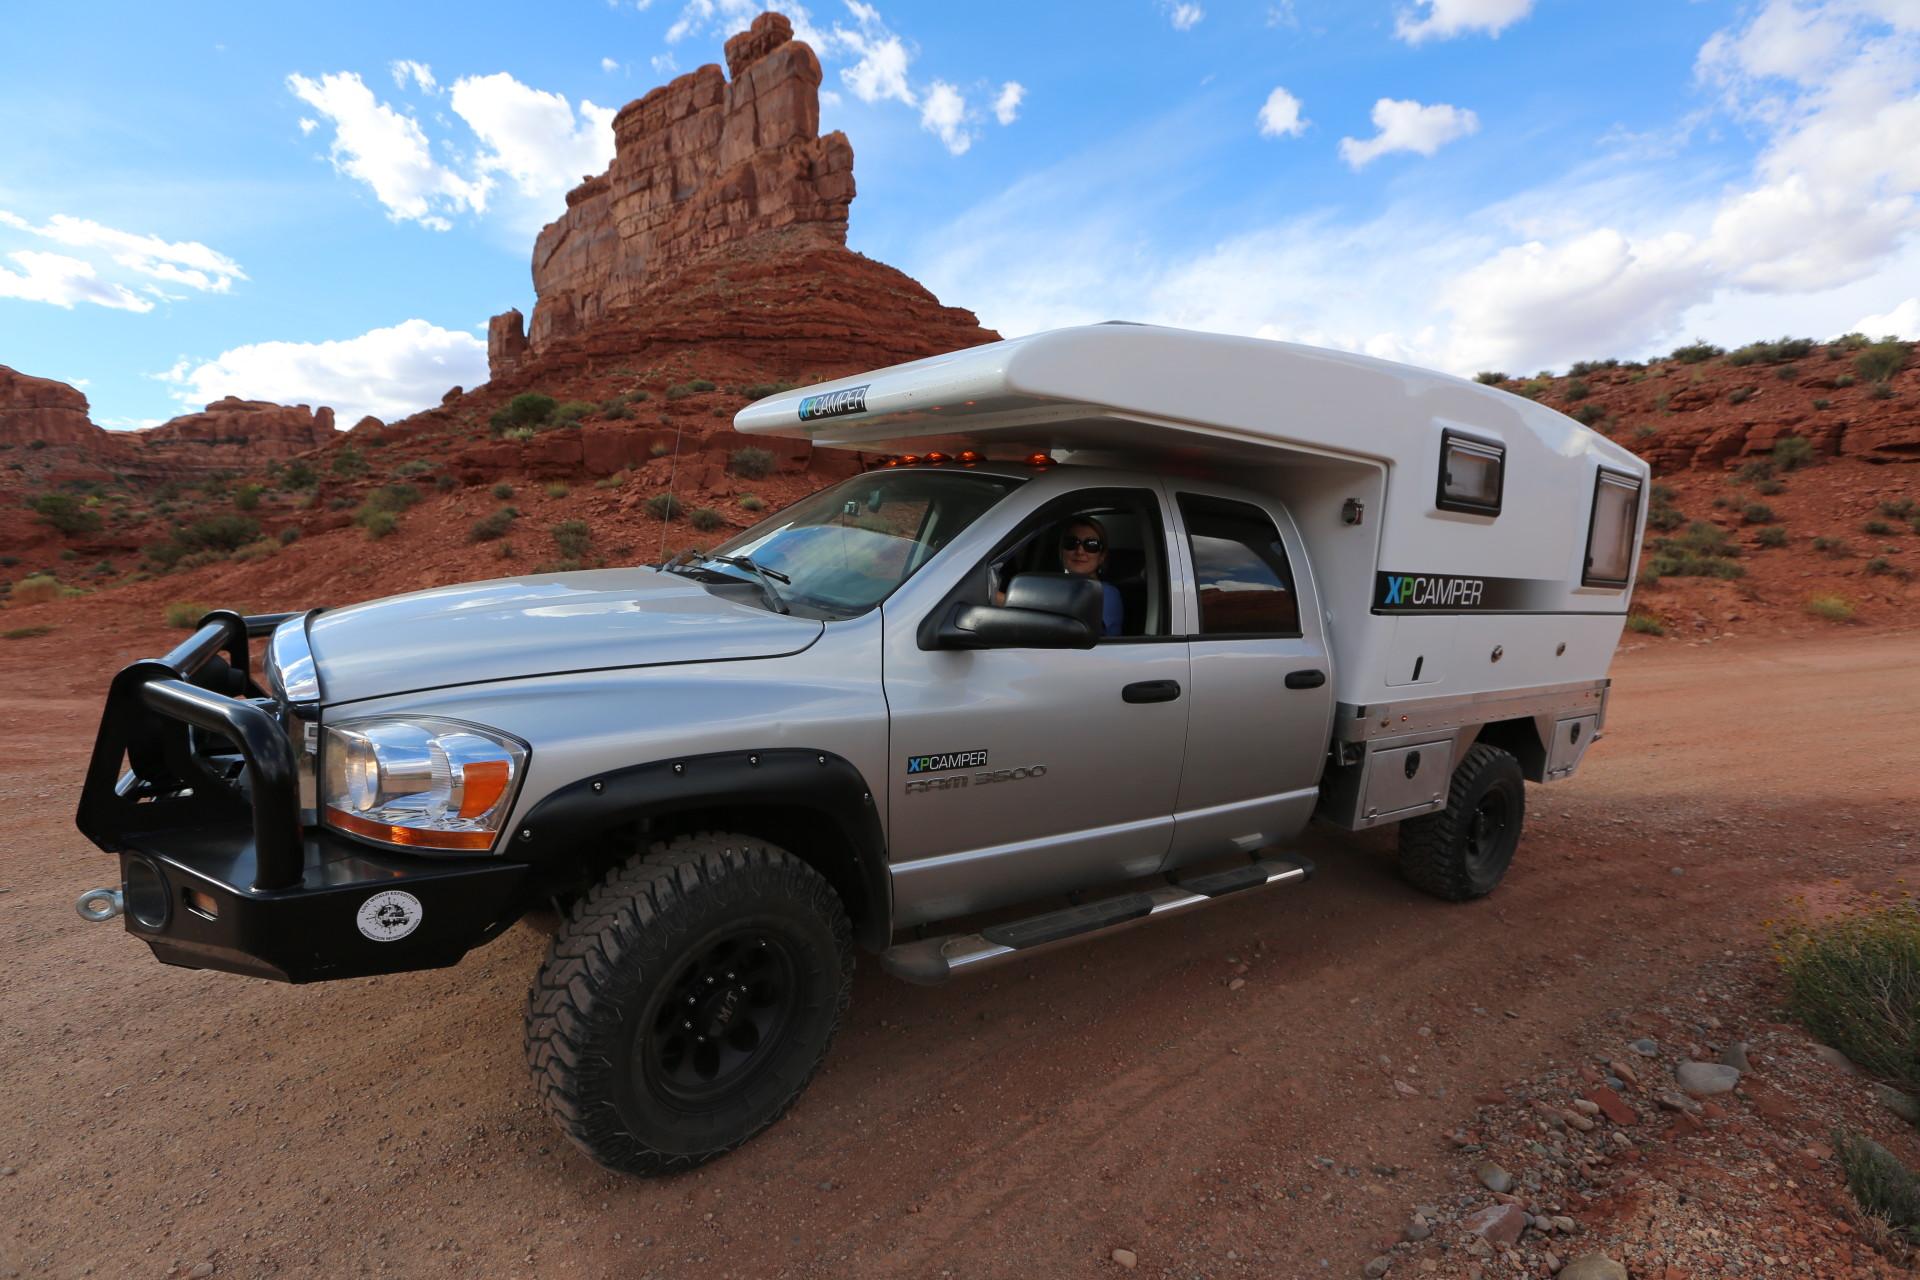 Used Dodge Caravan For Sale In Chicago Il Edmunds 2018